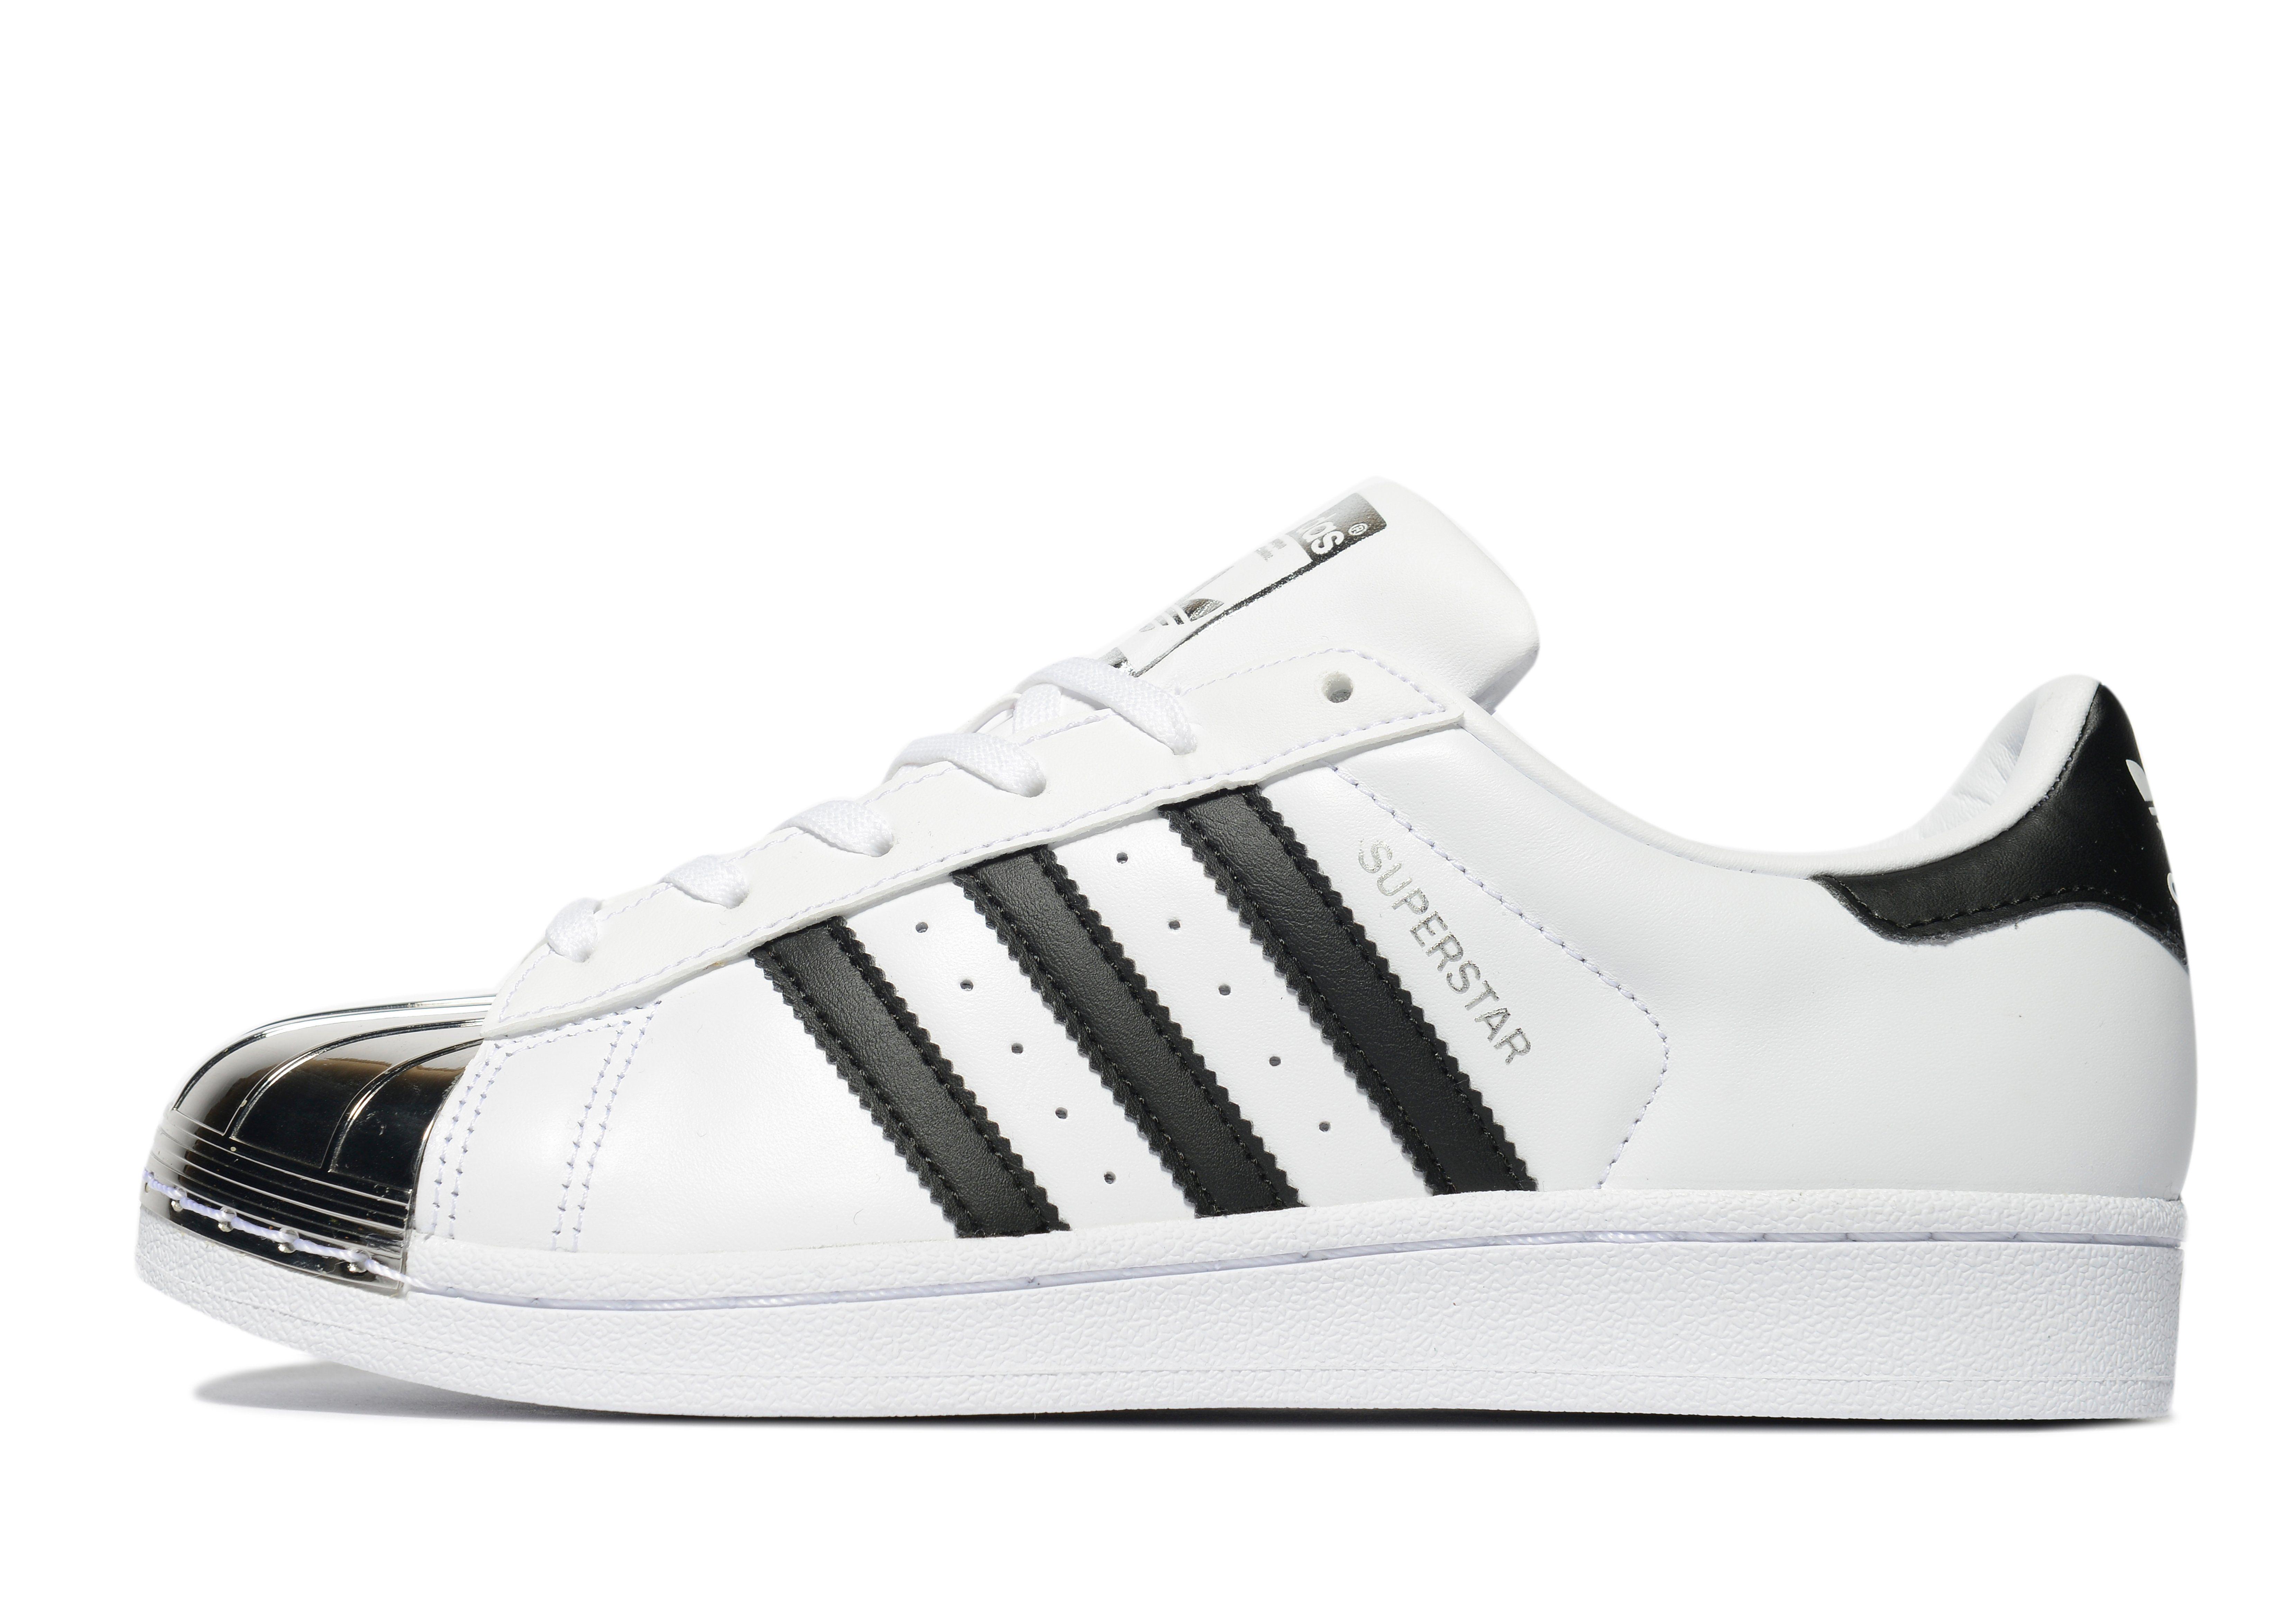 Adidas Superstar White And Black Women aoriginal.co.uk